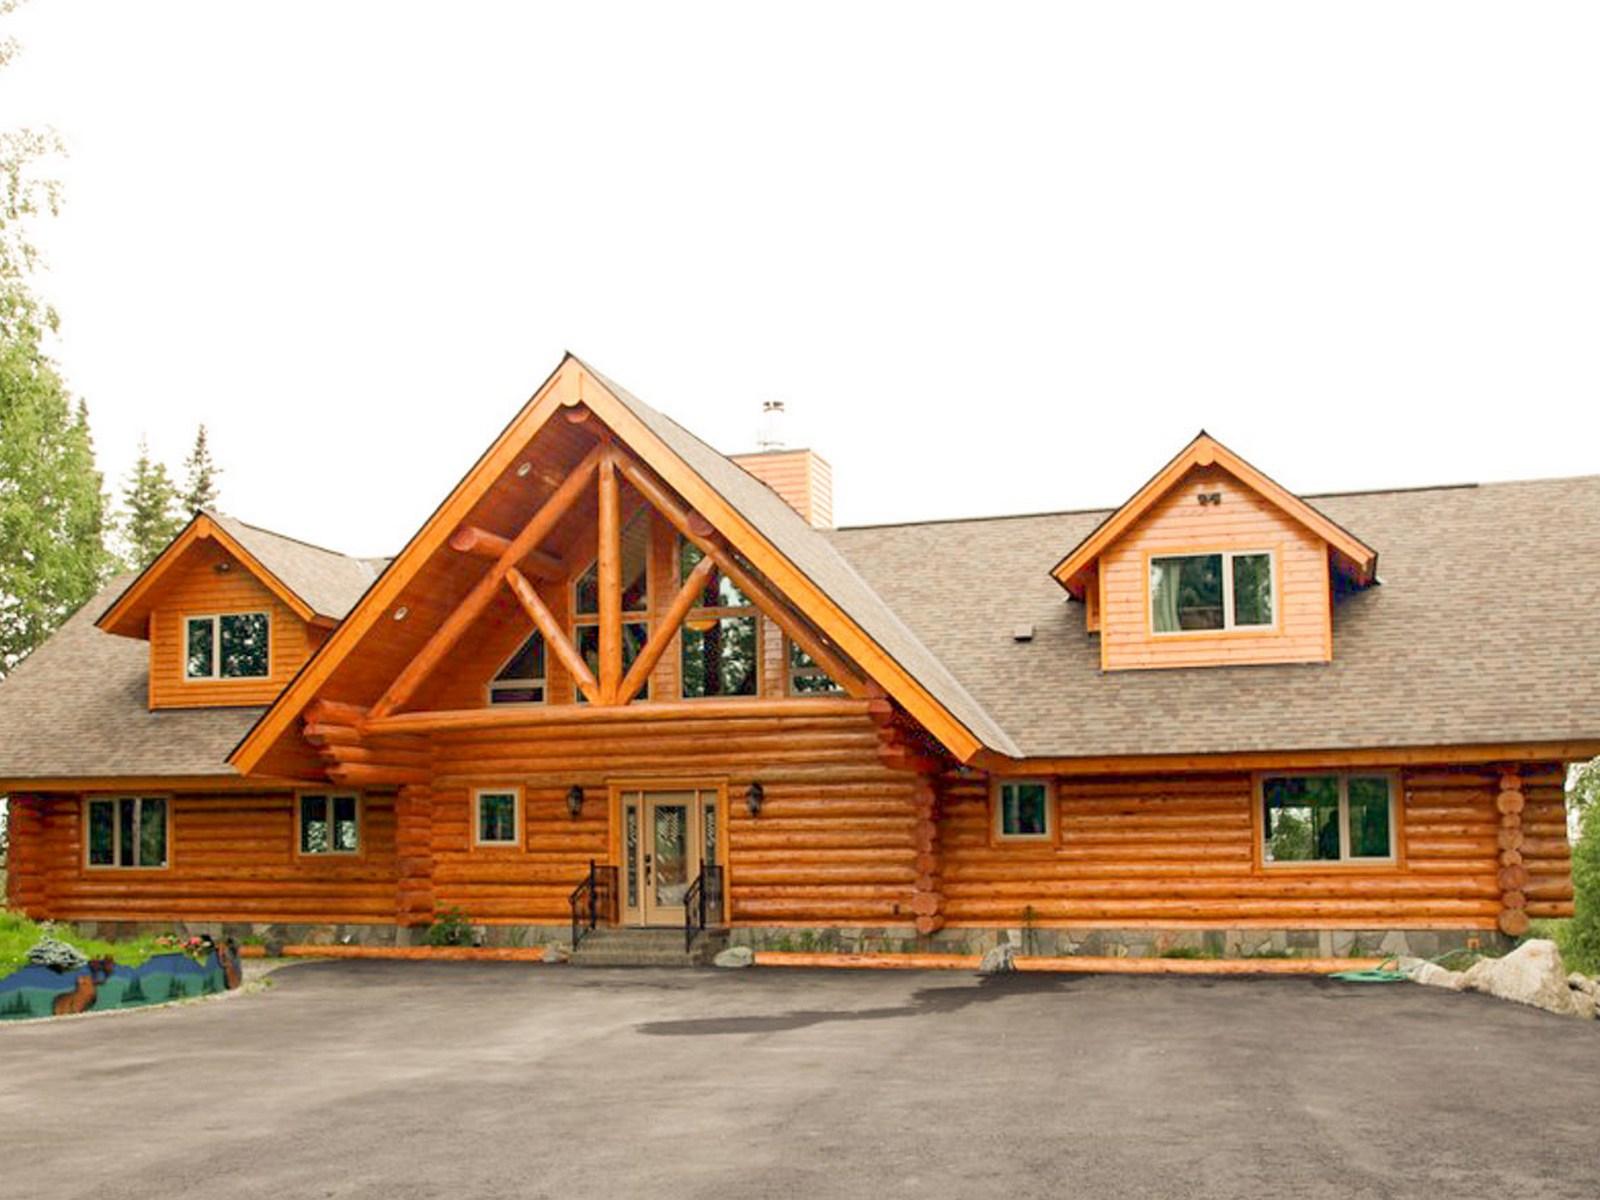 Single Family Home for Sale at Salmon Catchers Lodge 420 Endicott Drive Soldotna, Alaska 99669 United States